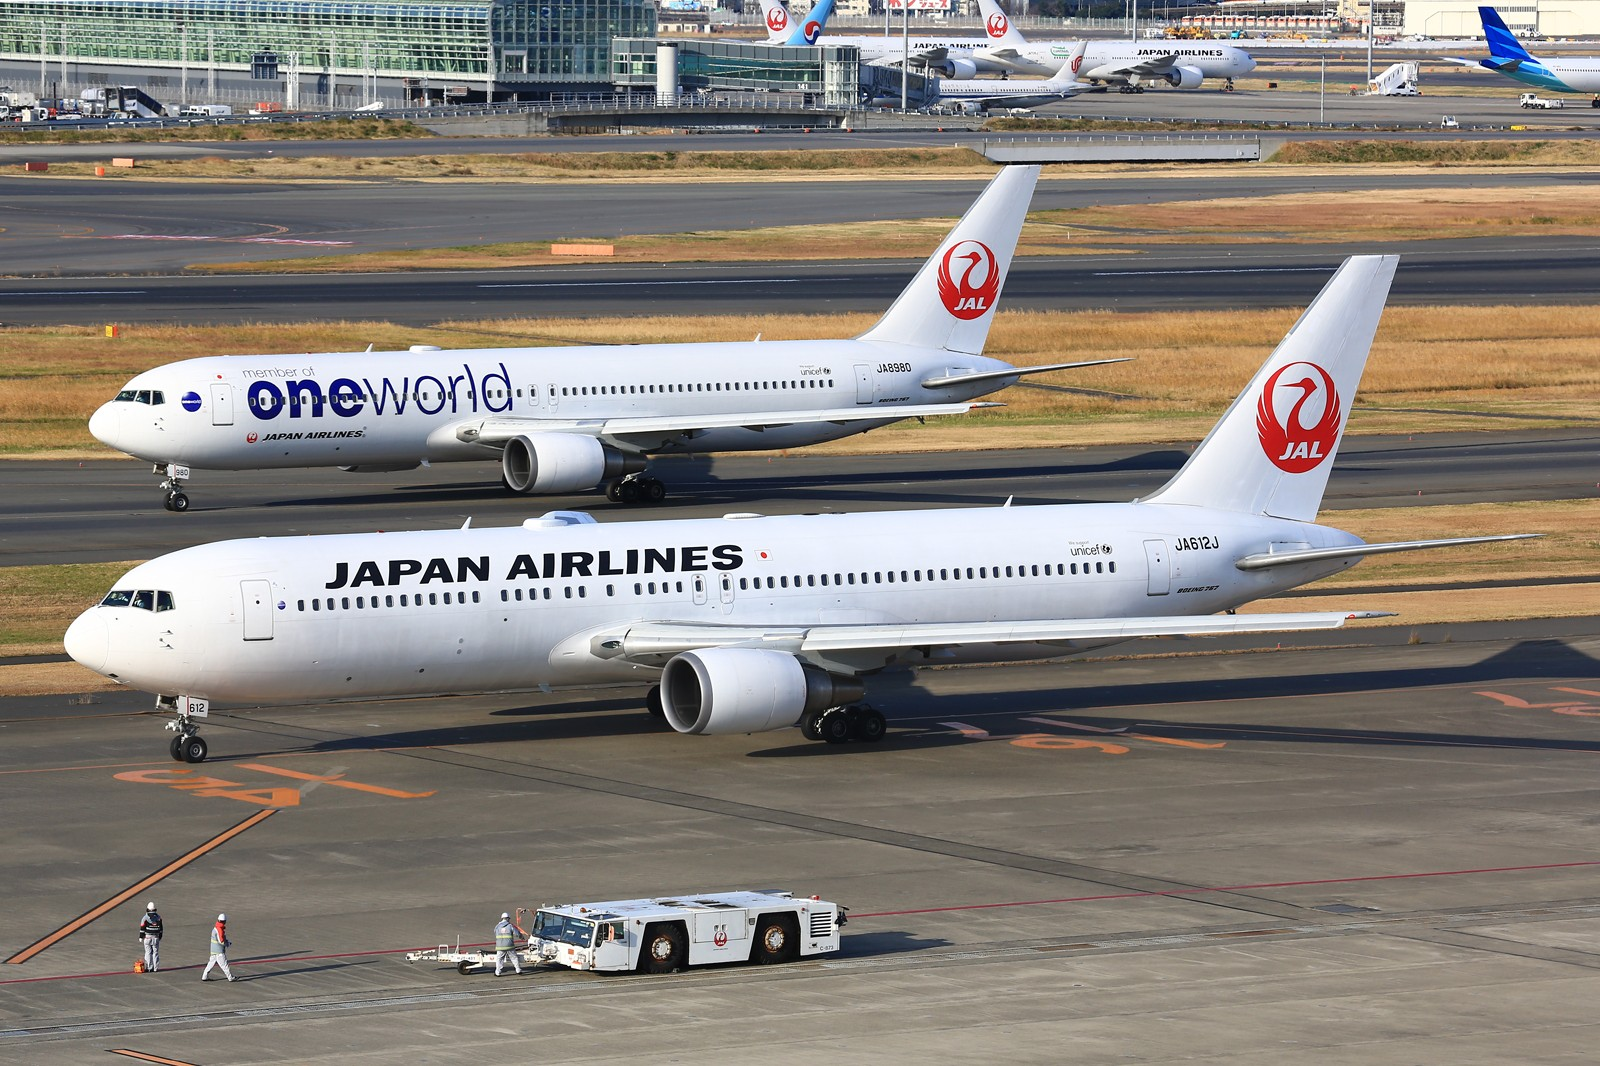 Re:[原创]【HND】******2016新年好,流窜羽田机场:全日空星战,汉莎1500th,以及一些大路货****** BOEING 767-300 JA612J 日本东京羽田国际机场